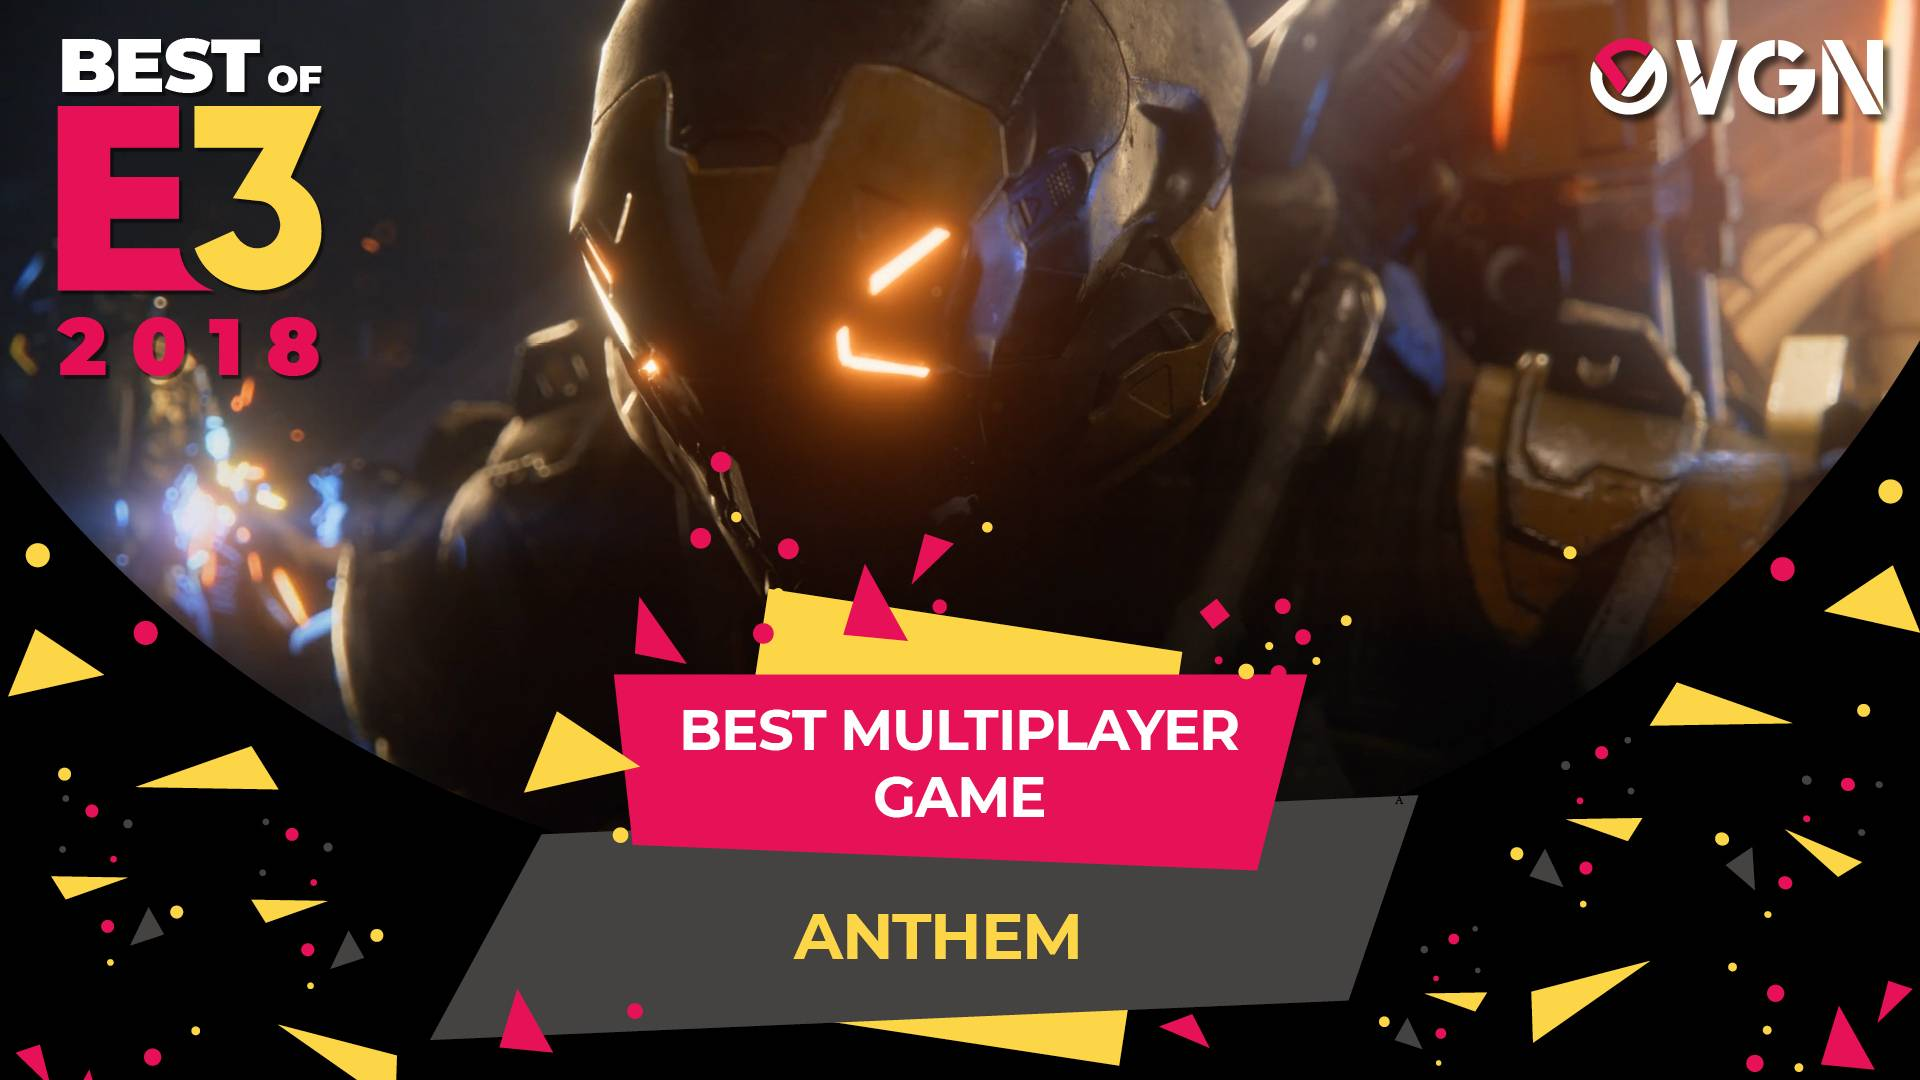 E3 2018 - Best Multiplayer Game - Anthem